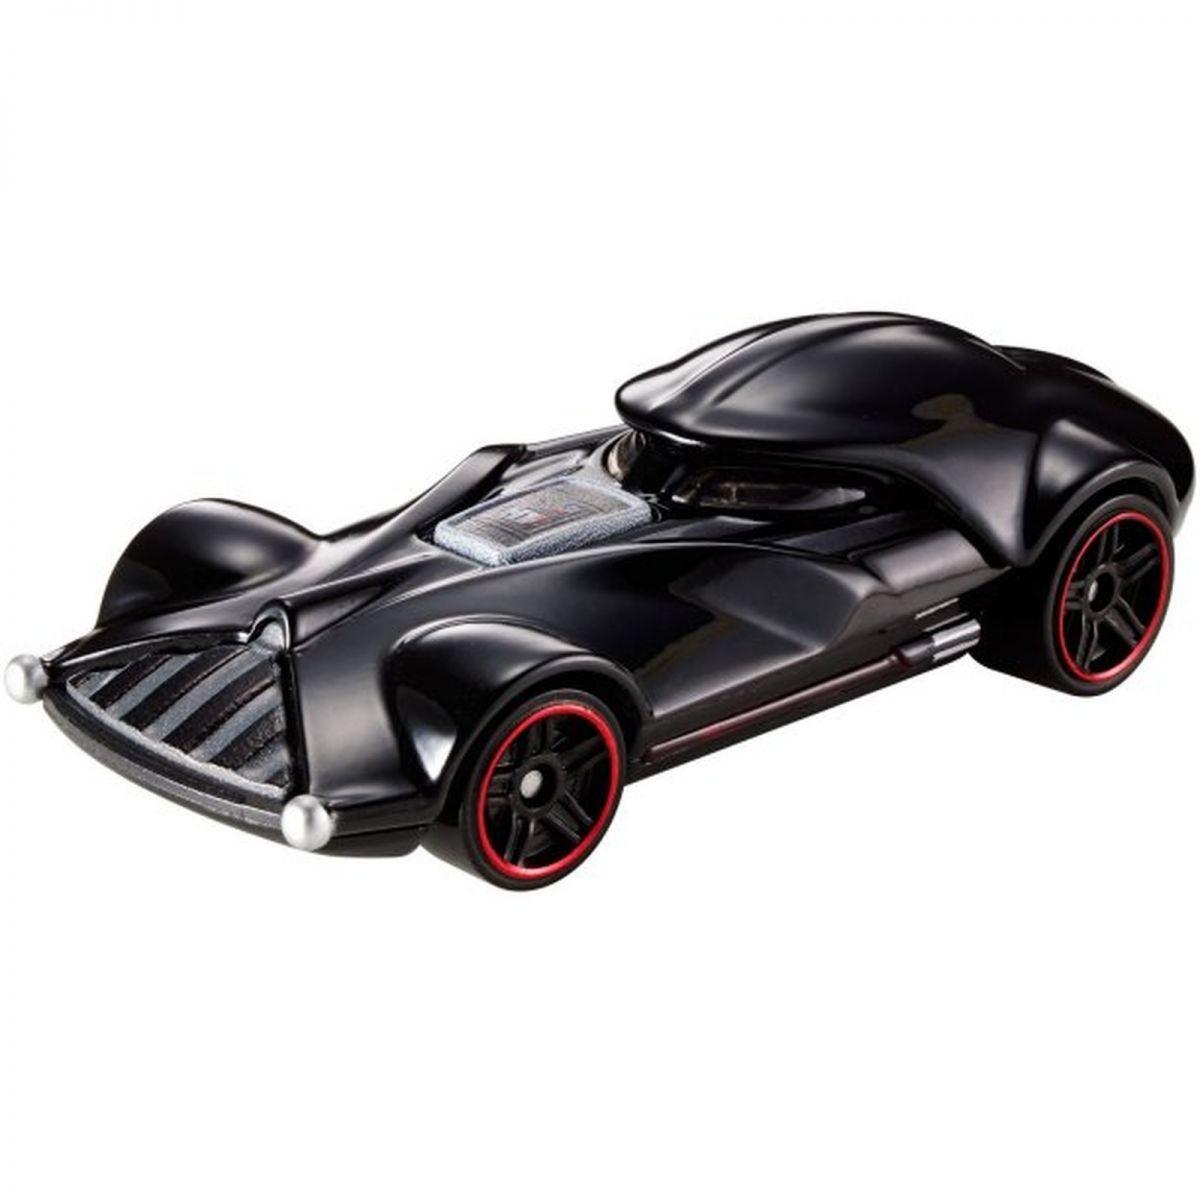 Star Wars: Darth Vader - Hot Wheels